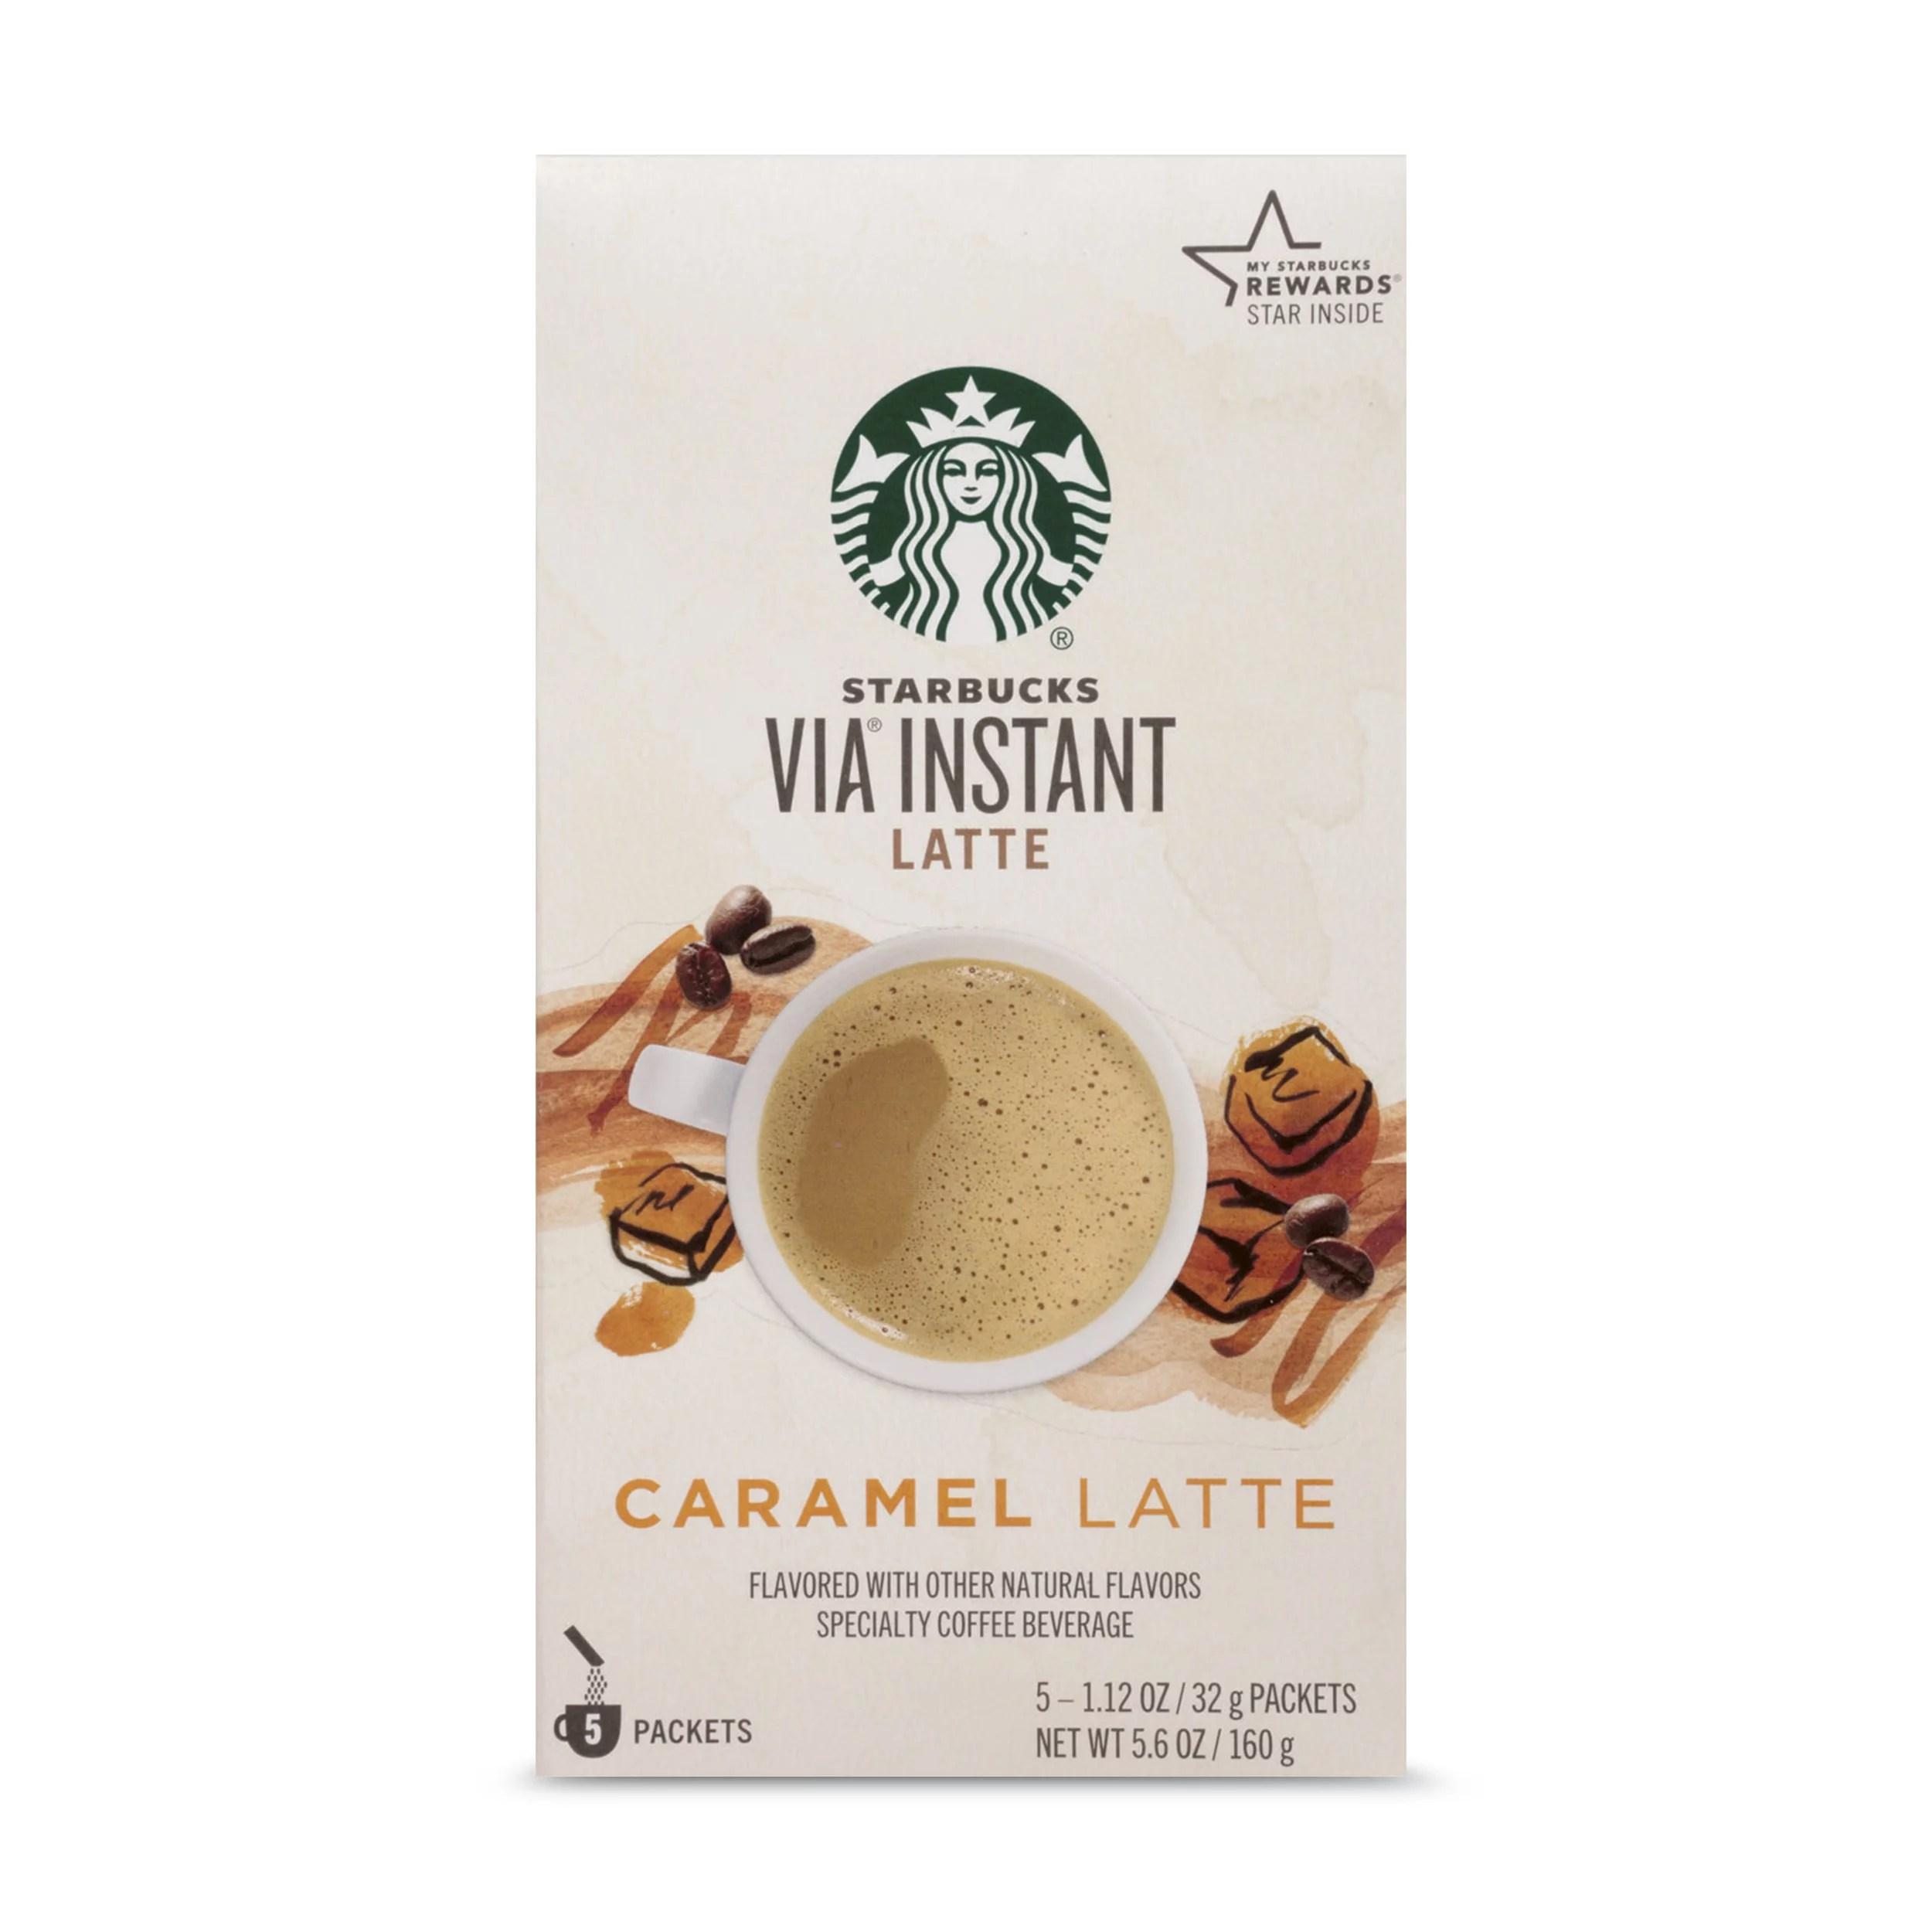 Starbucks VIA Instant Caramel Latte (1 box of 5 packets ...